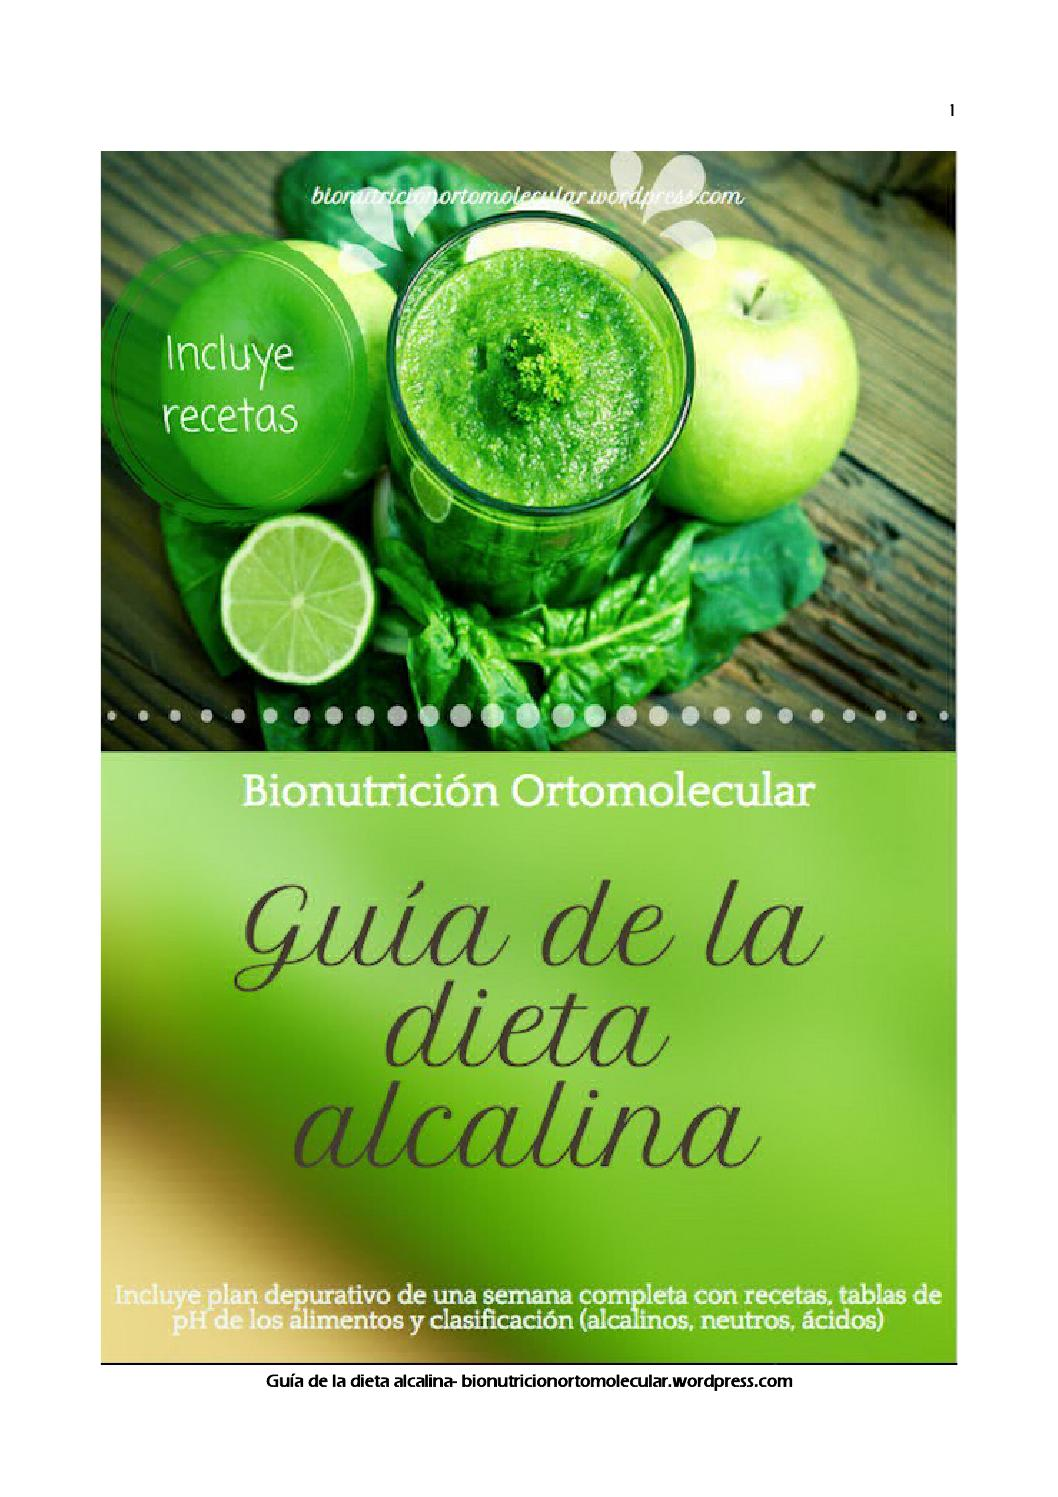 ejemplo dieta alcalina semanal